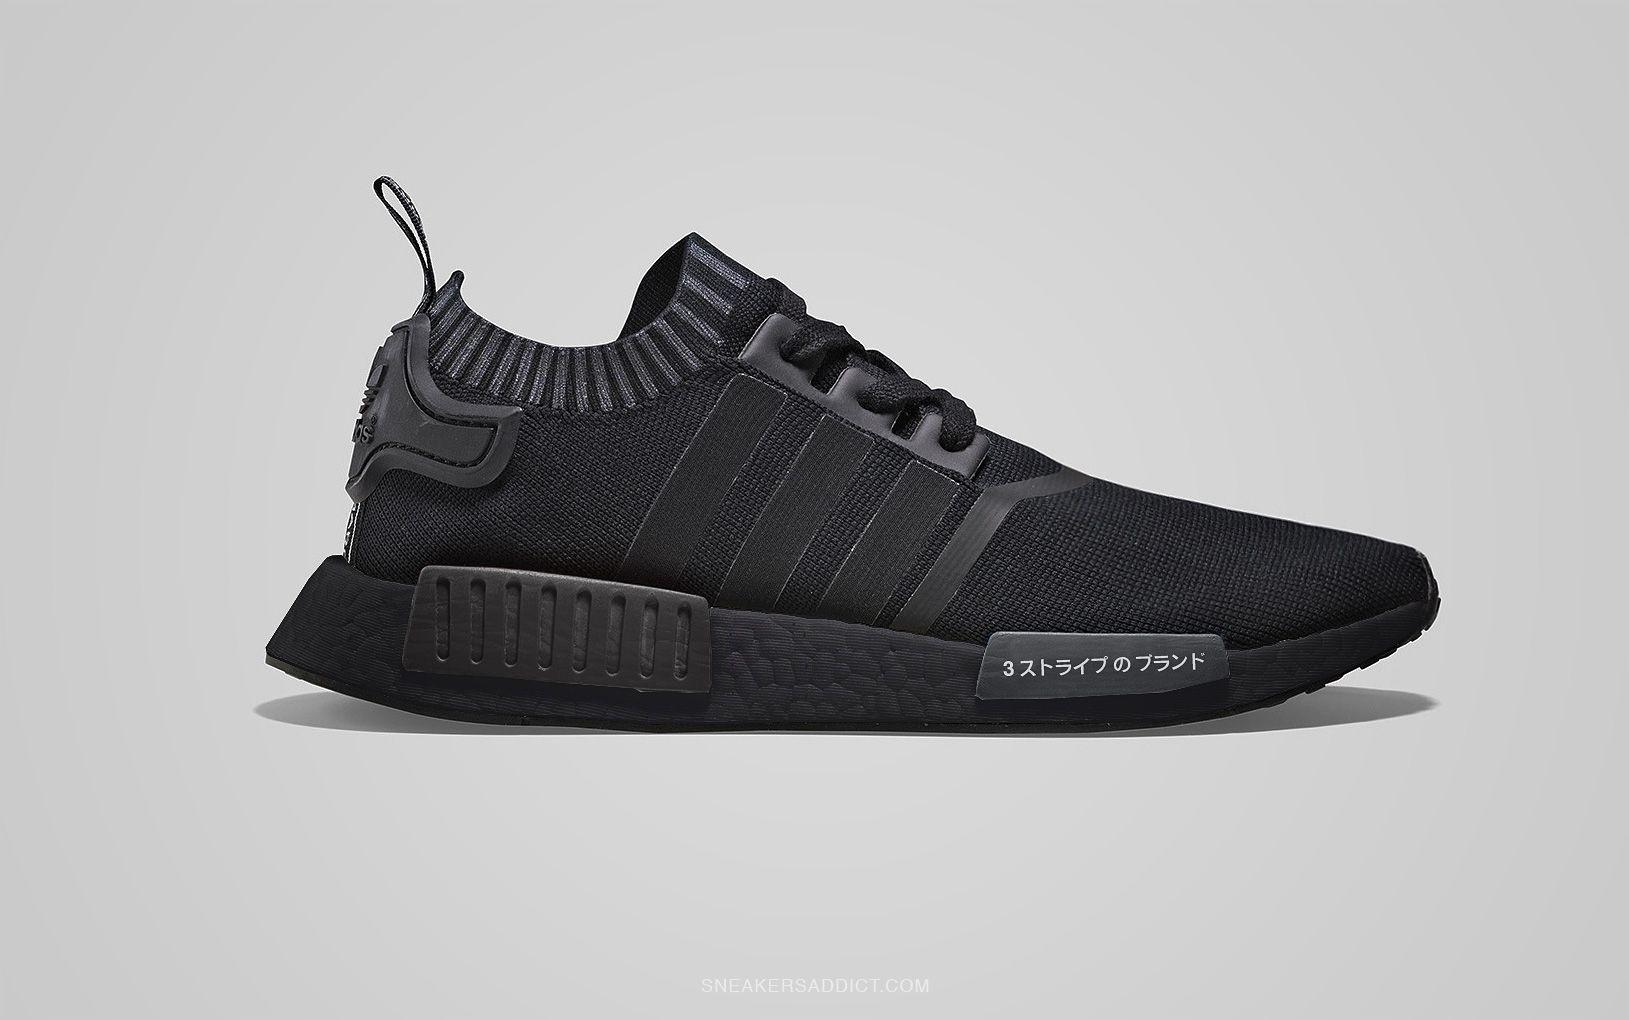 Adidas Nmd Total Black